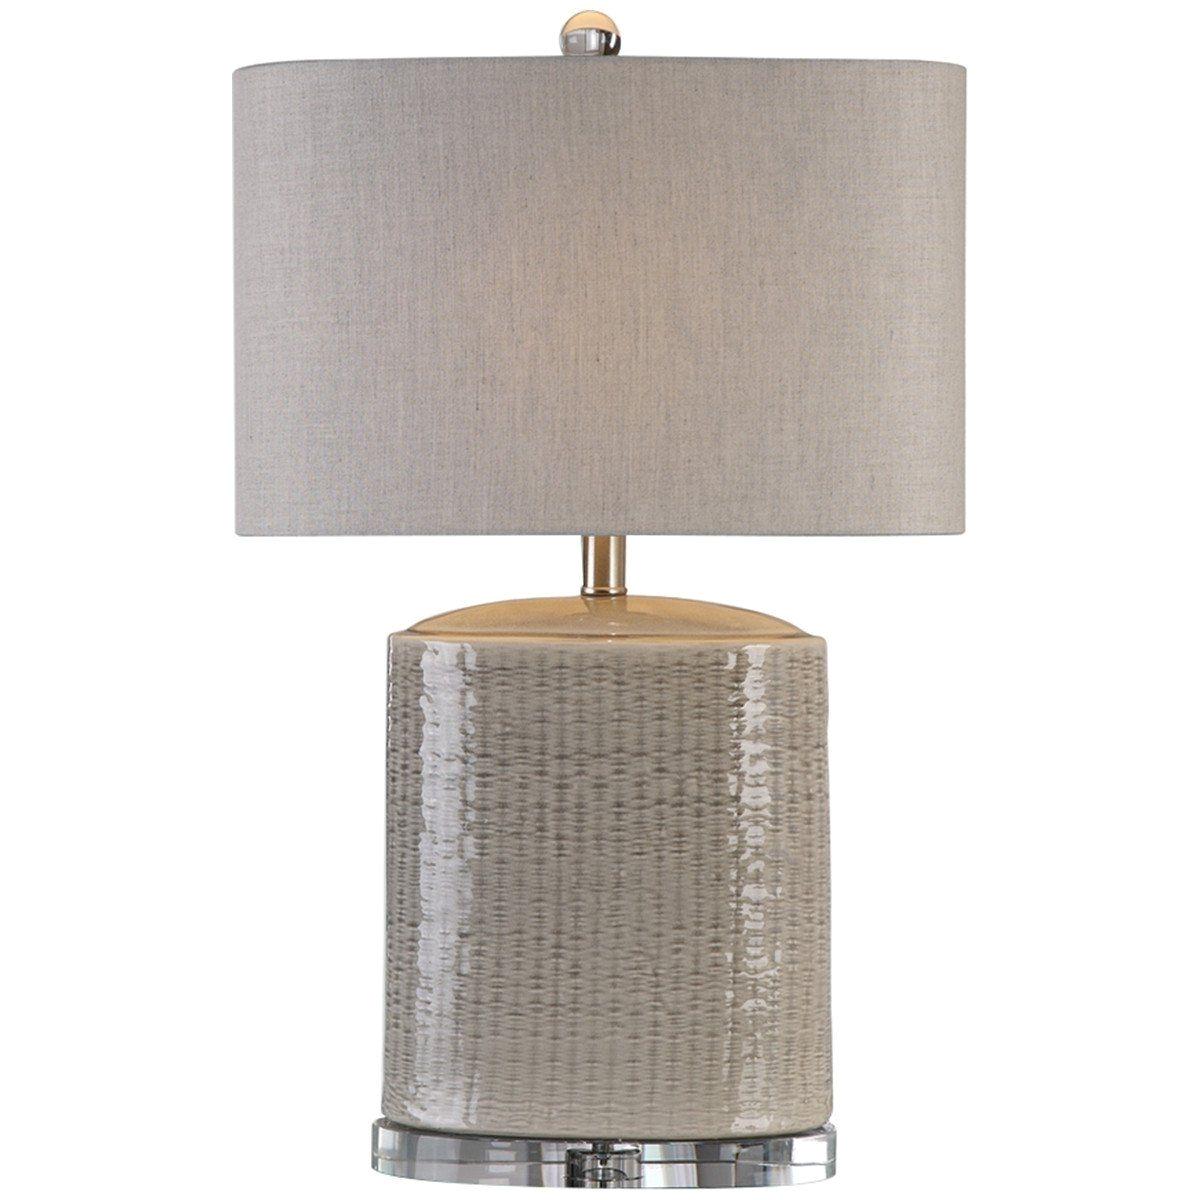 uttermost modica table lamp